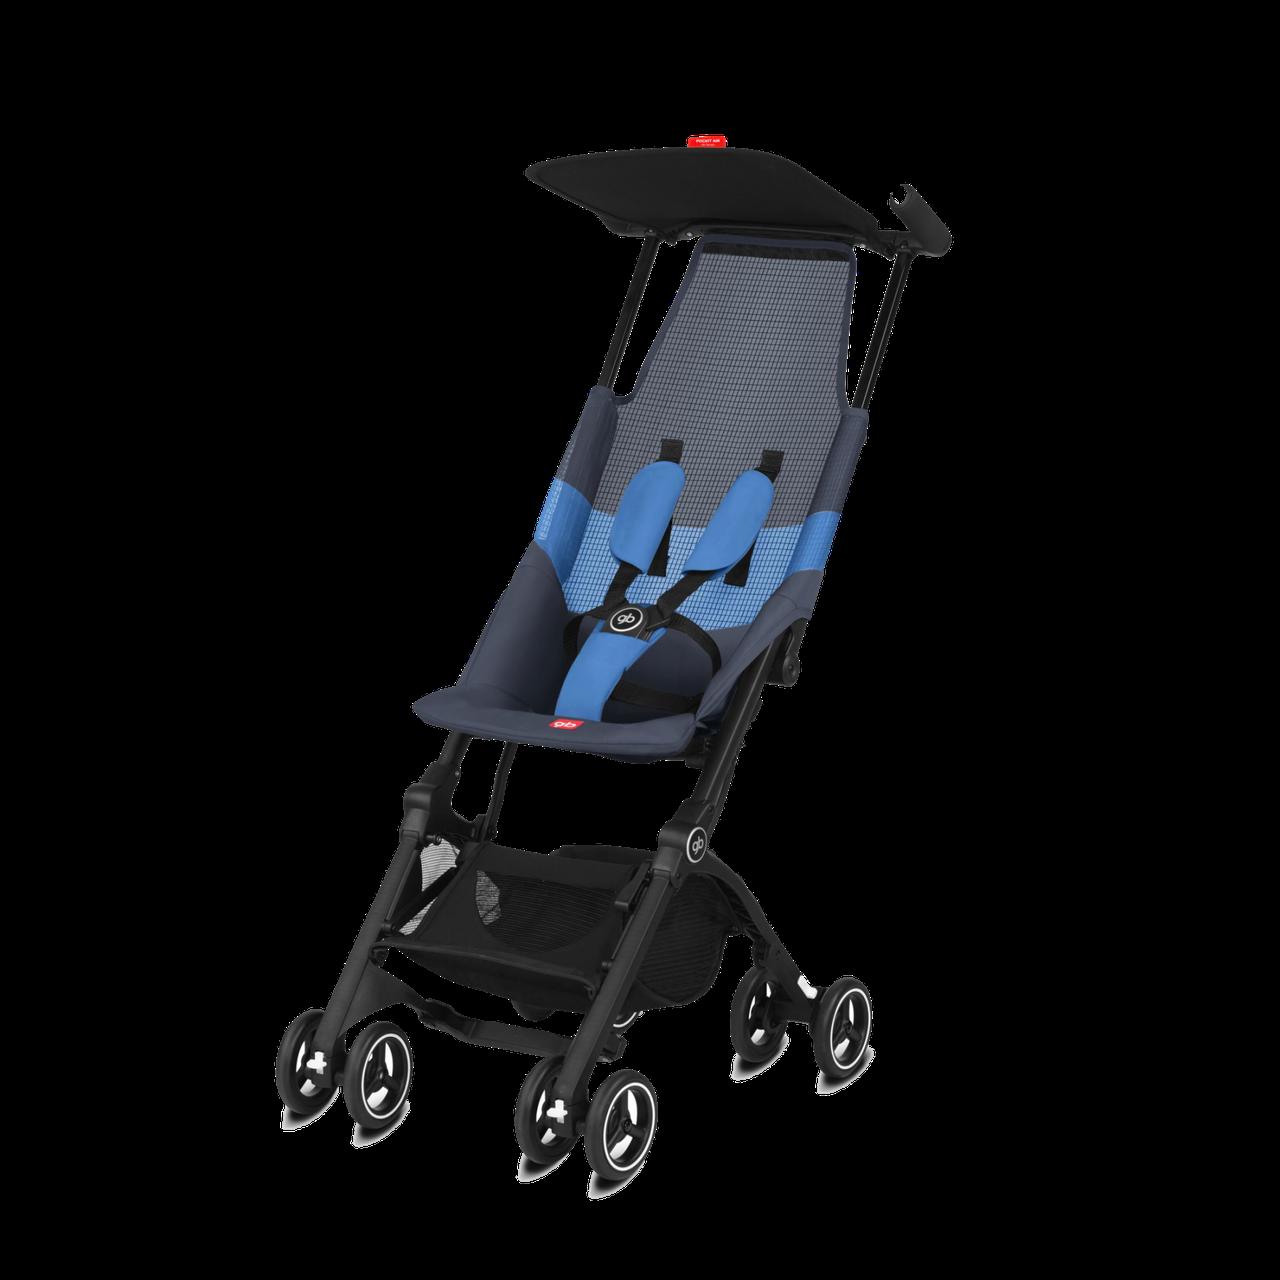 GB - Коляска Pockit Air All-Terrain, цвет Night Blue